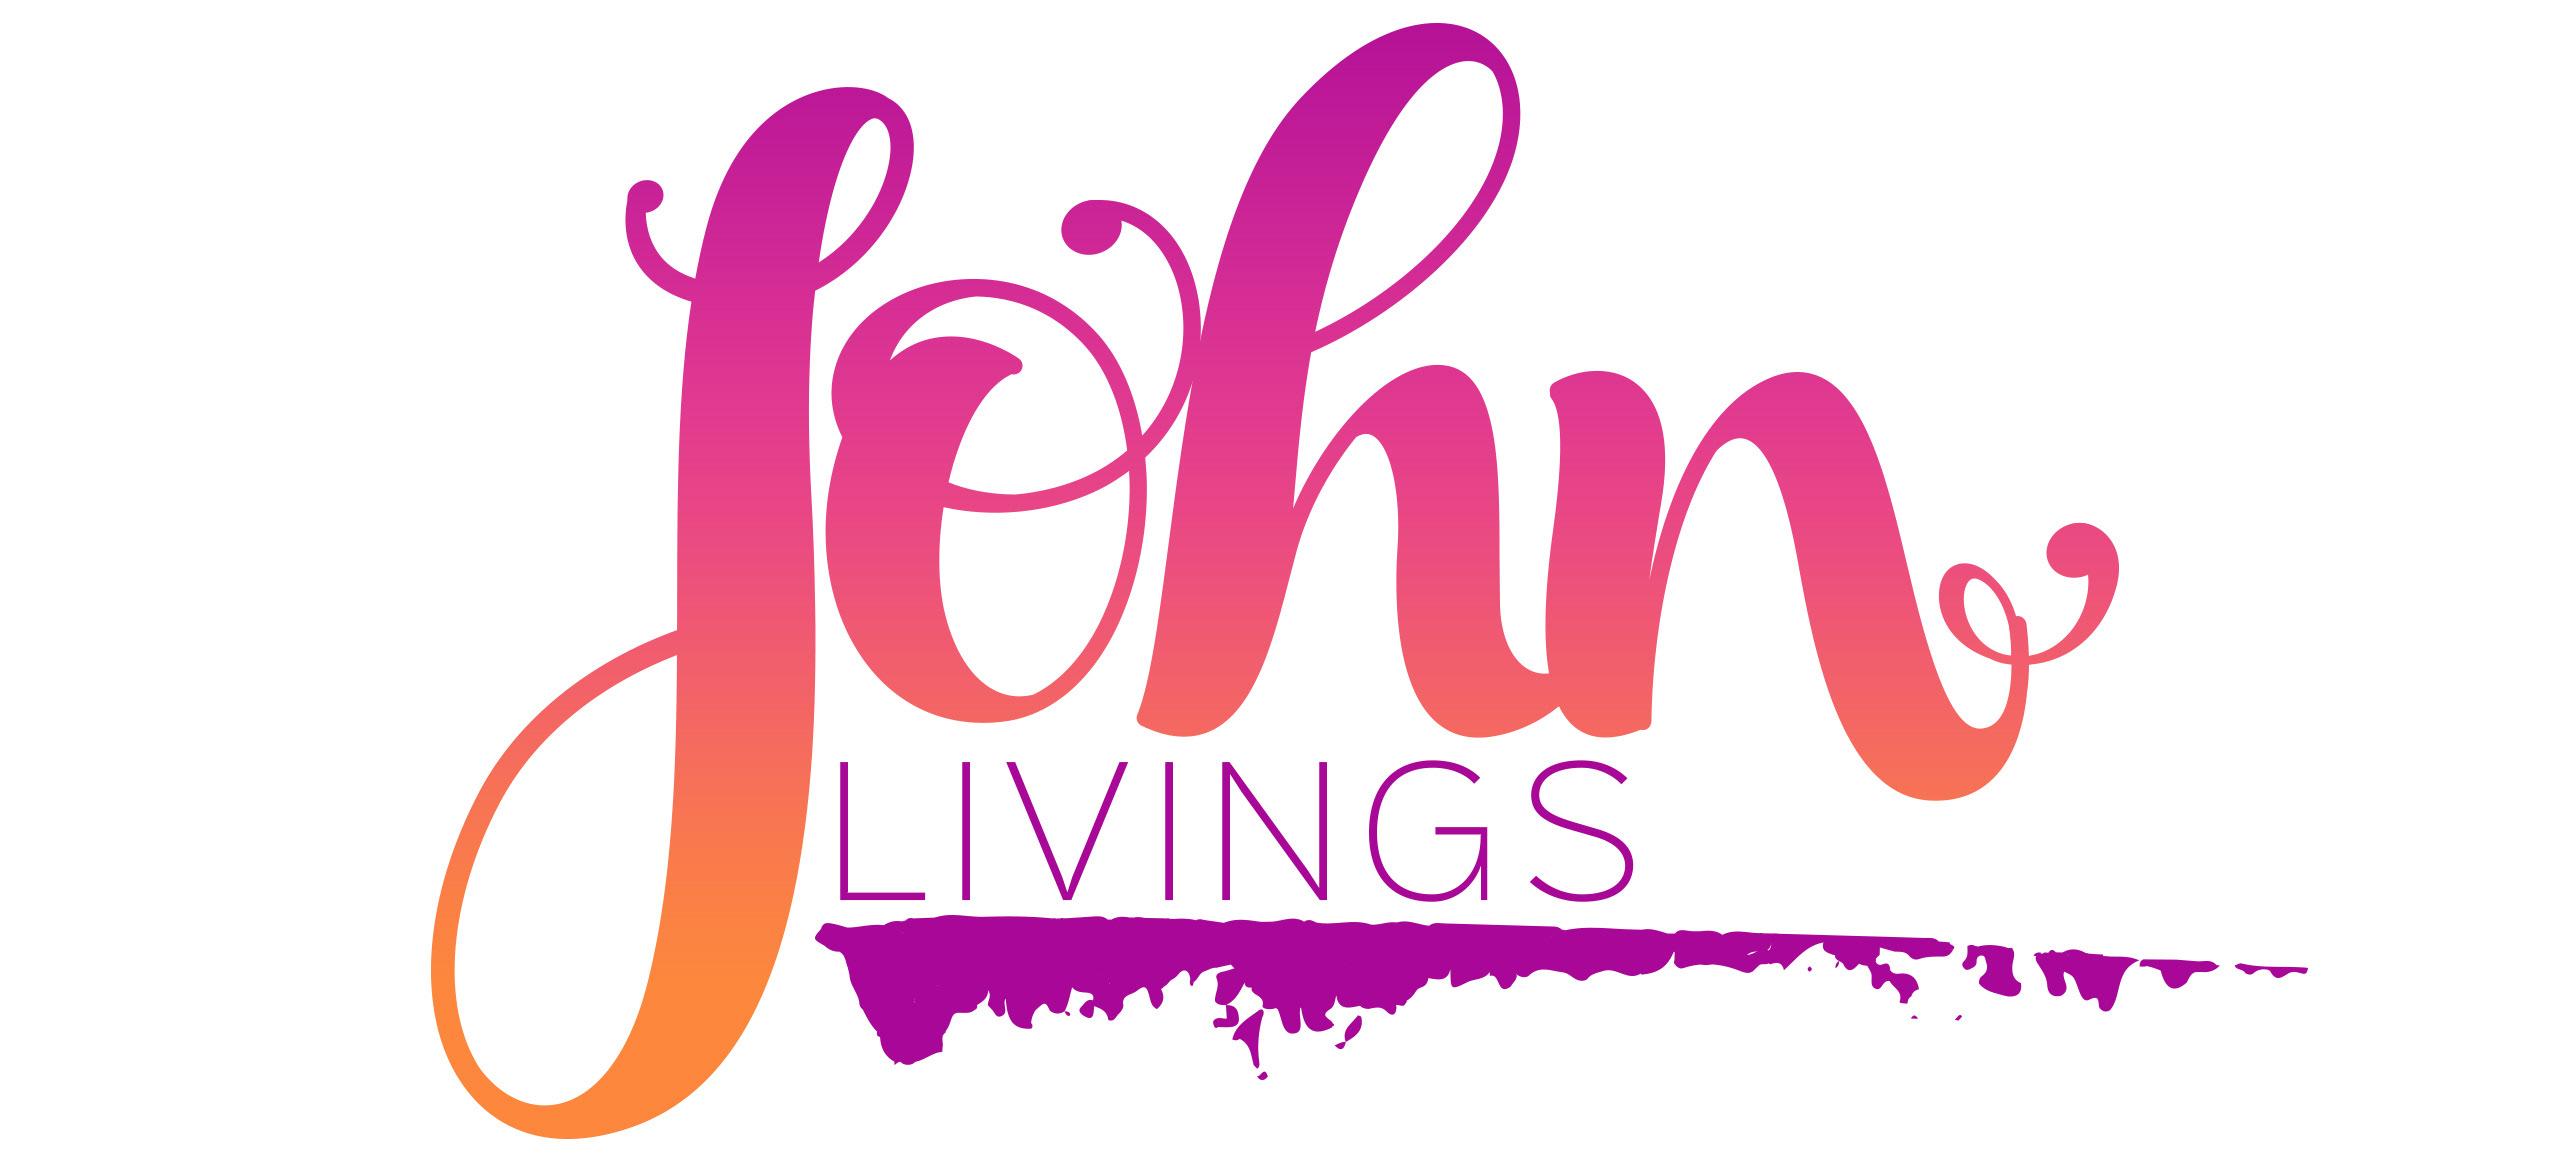 John Livings